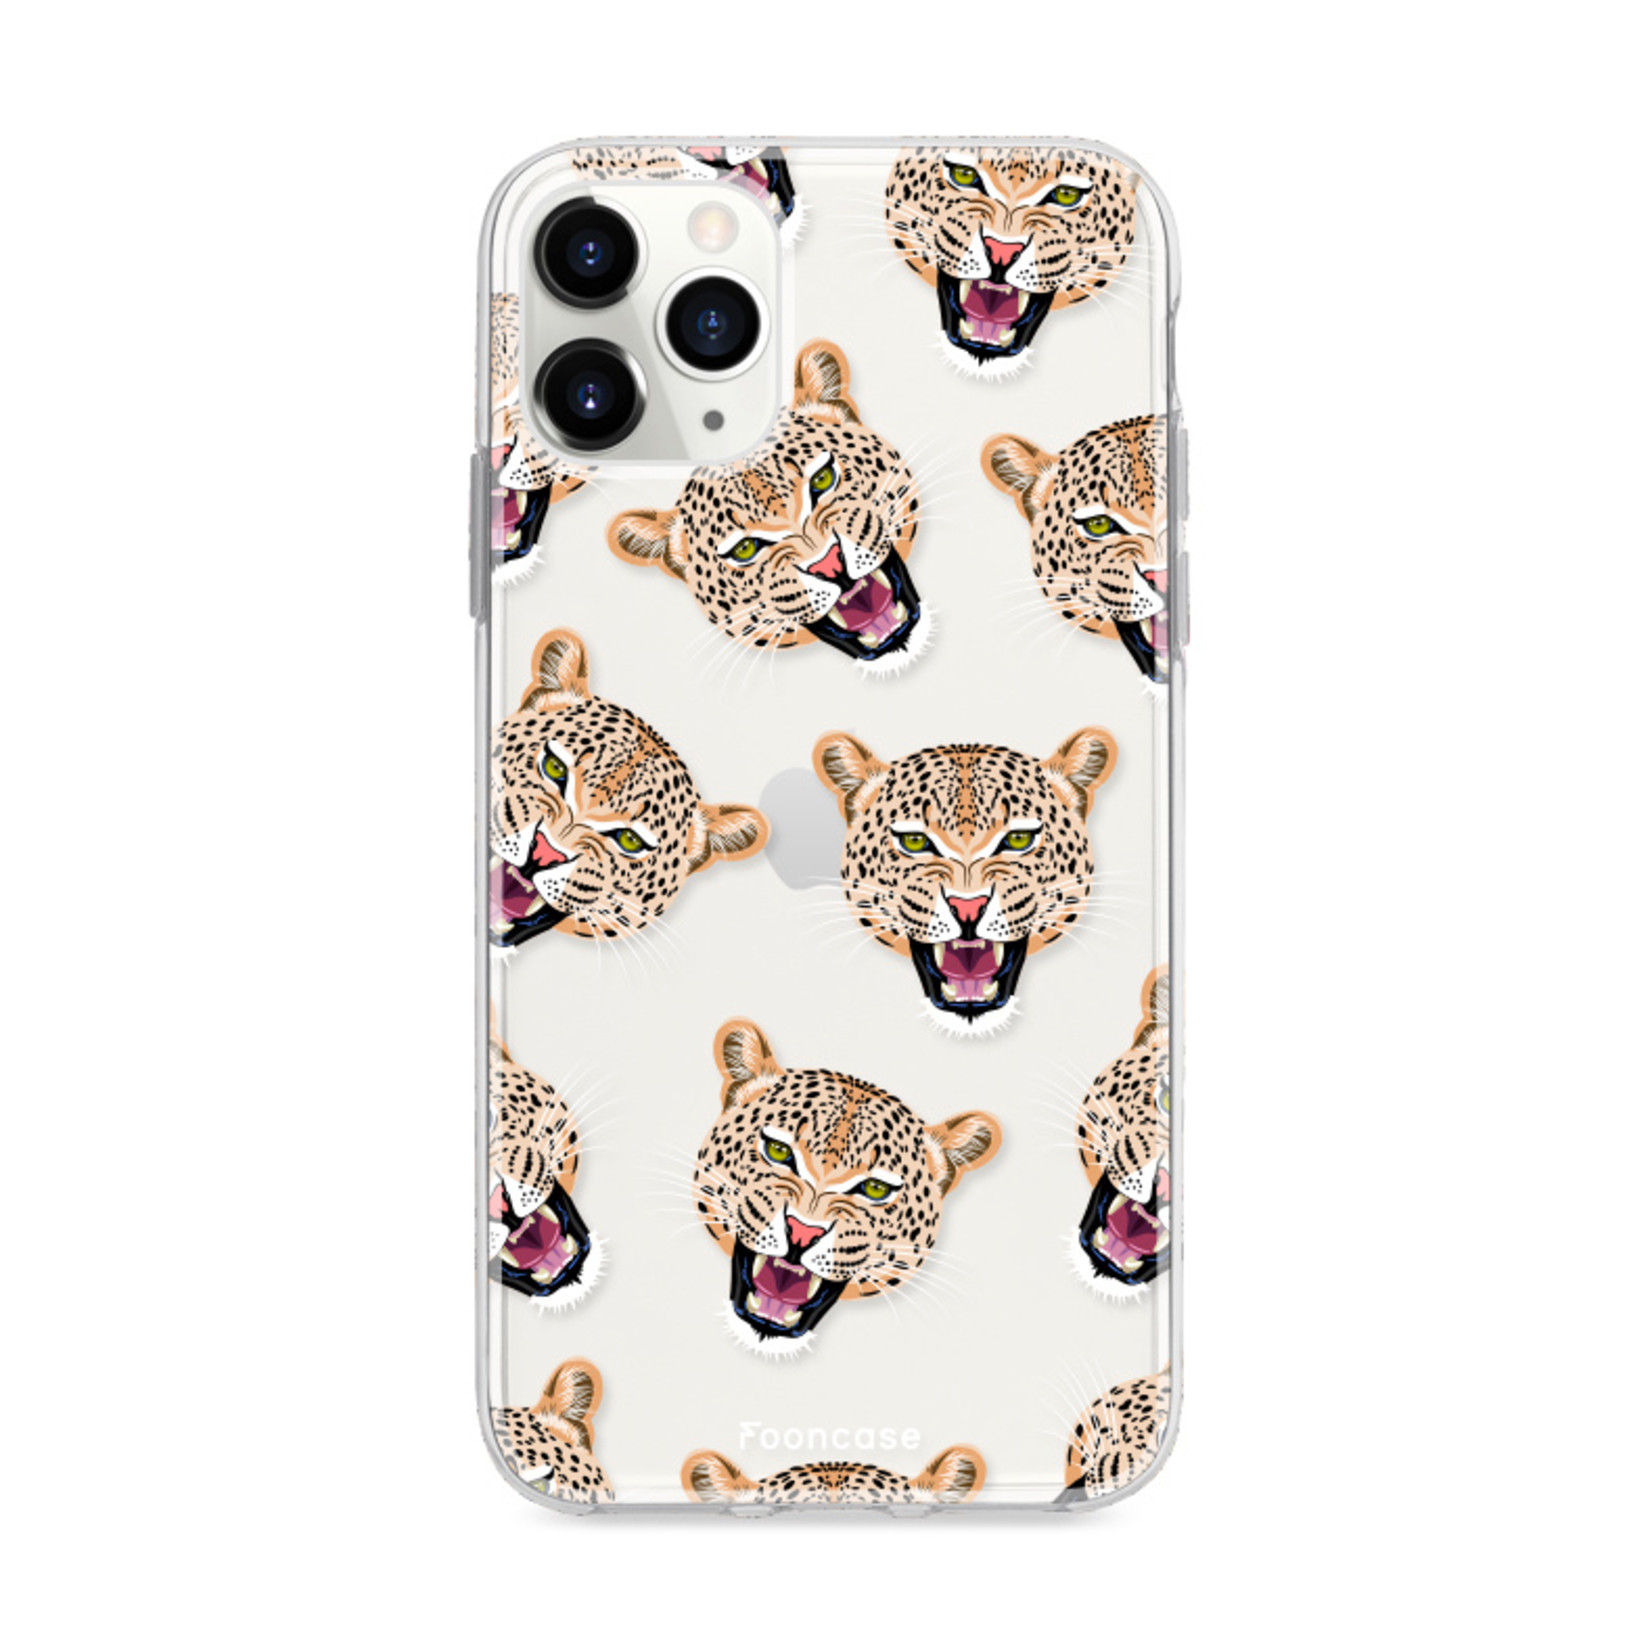 FOONCASE IPhone 12 Pro Max Case - Cheeky Leopard